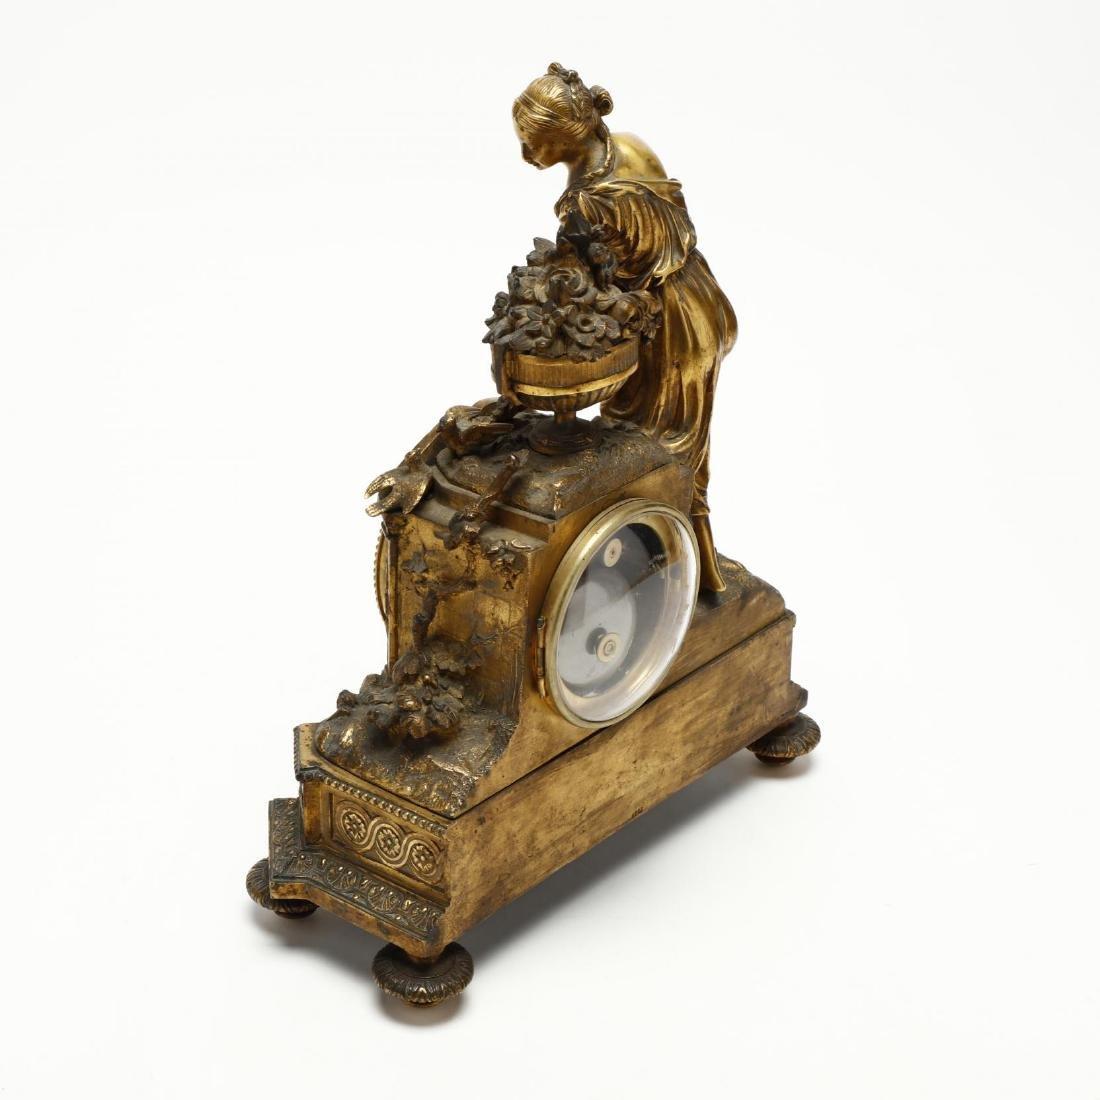 Antique French Gilt Bronze Figural Mantel Clock - 4